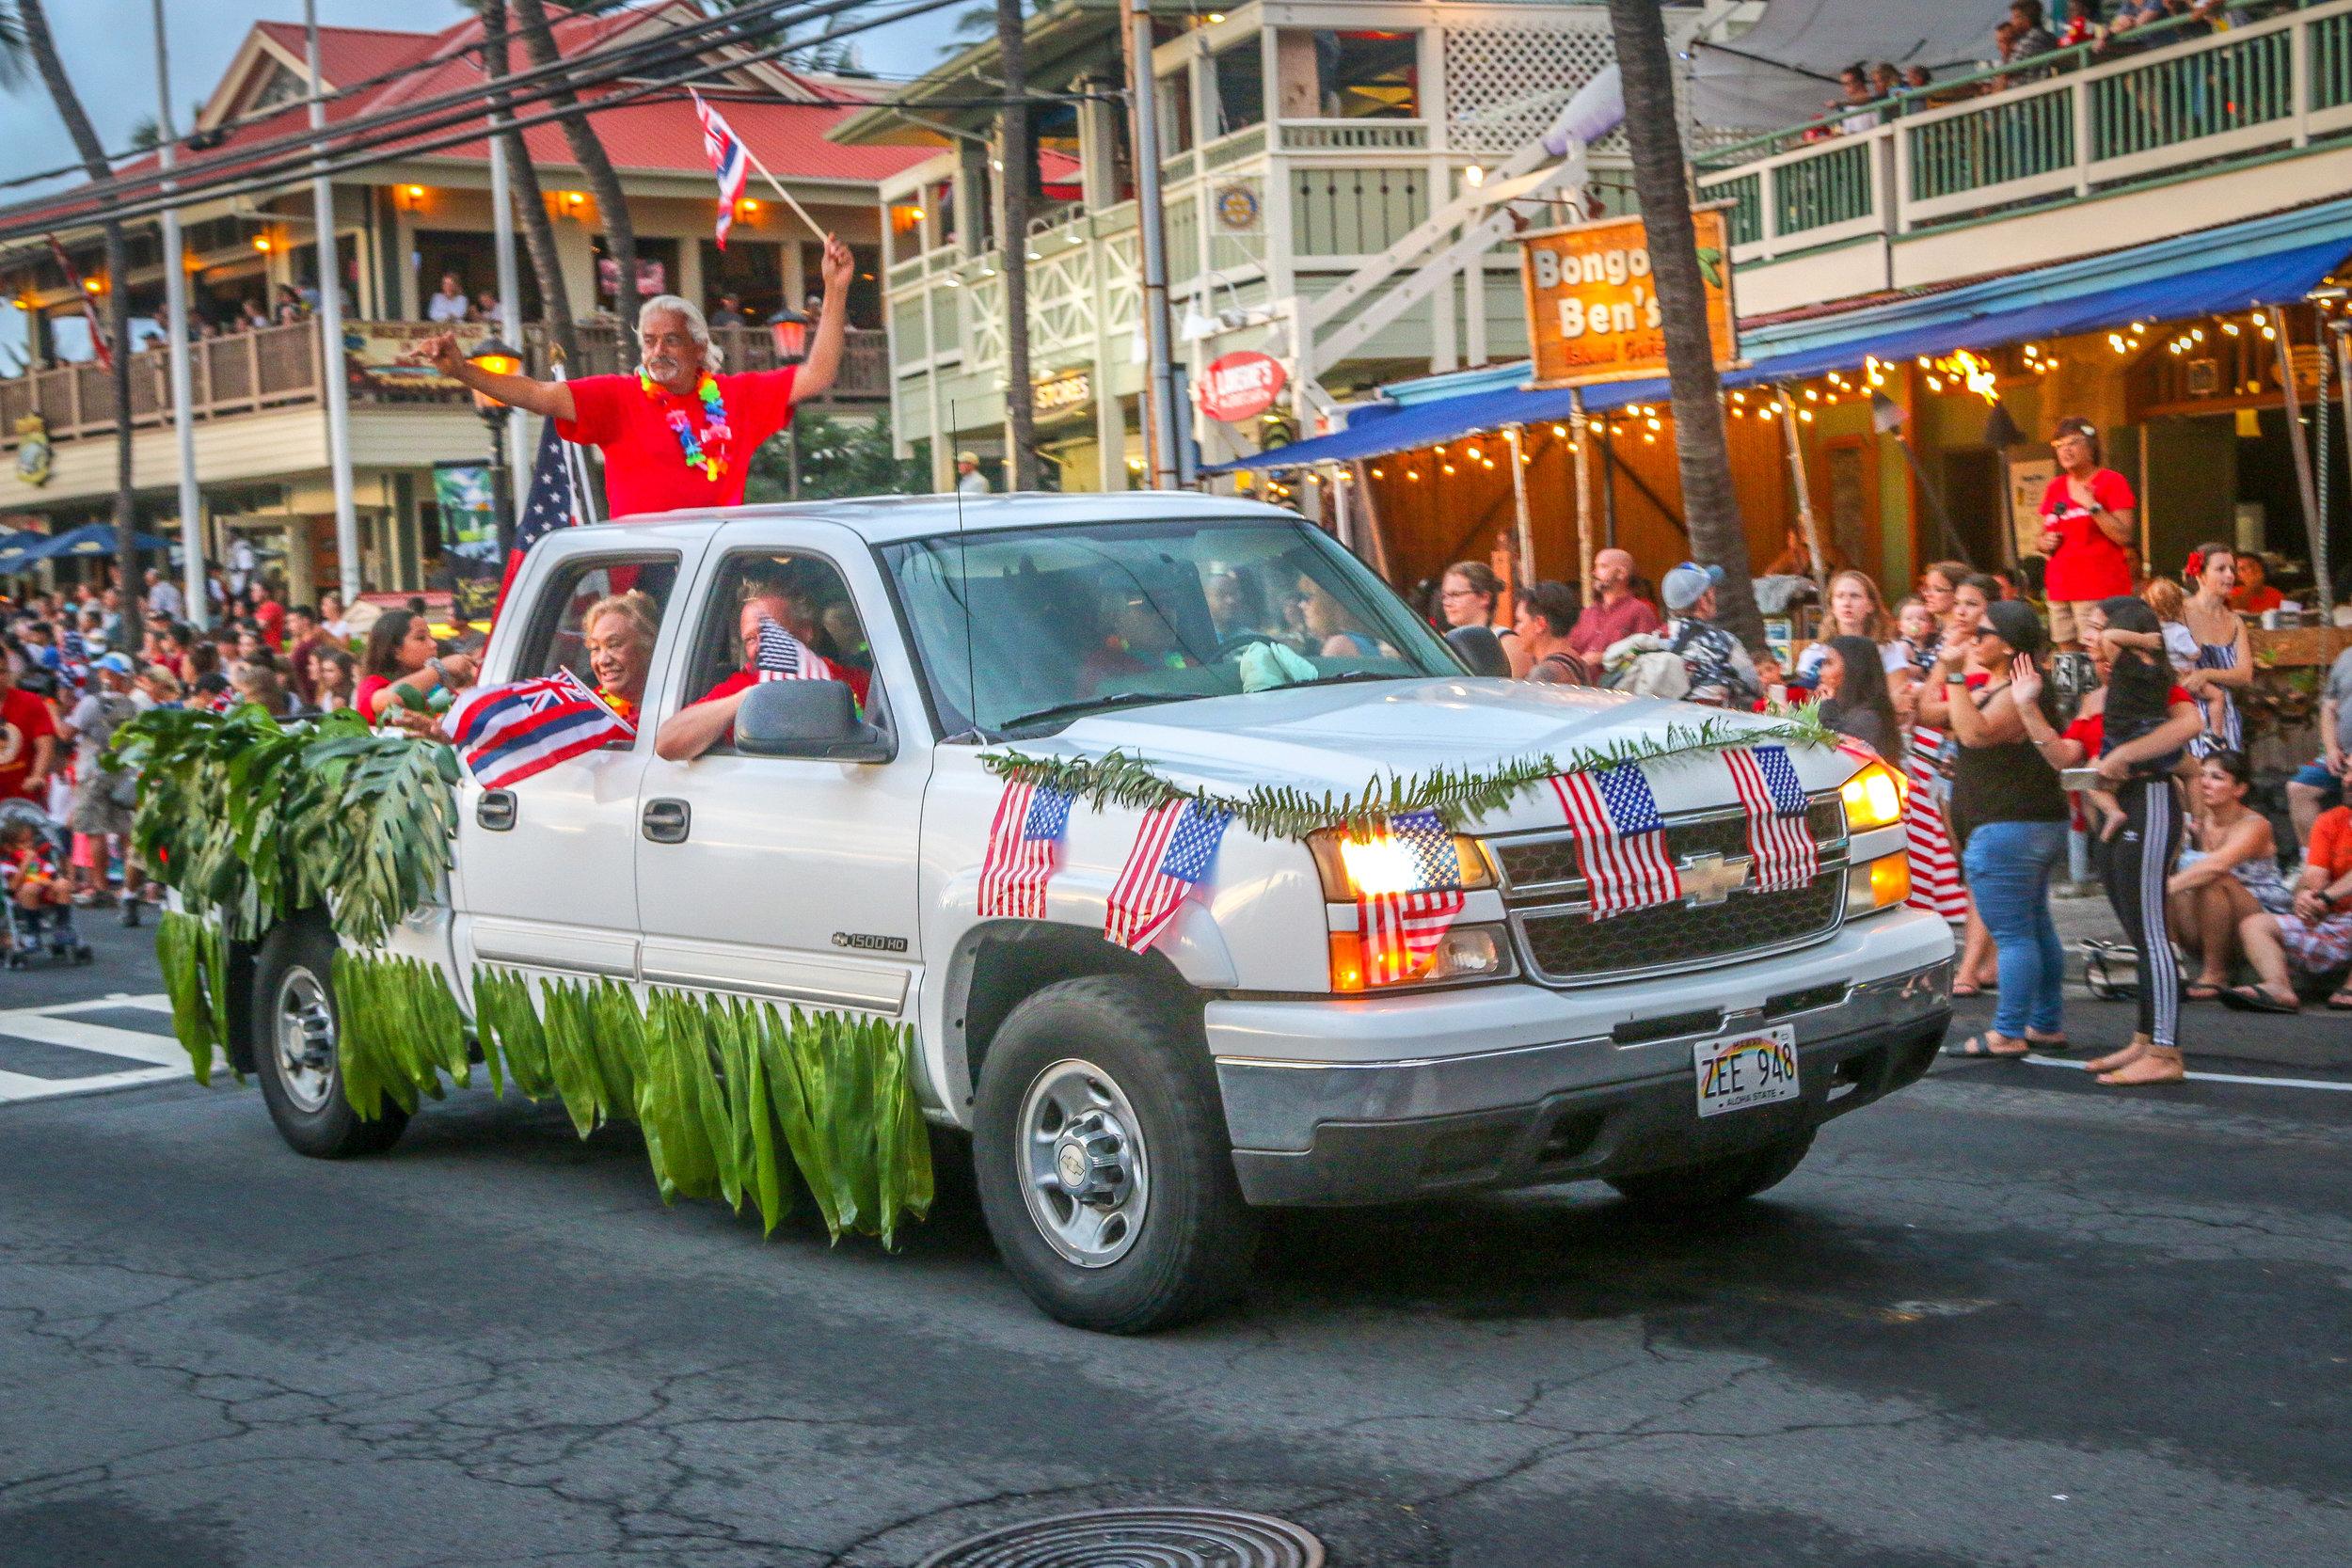 4th of July Parade Kailua Kona Hawaii HI photos 2019